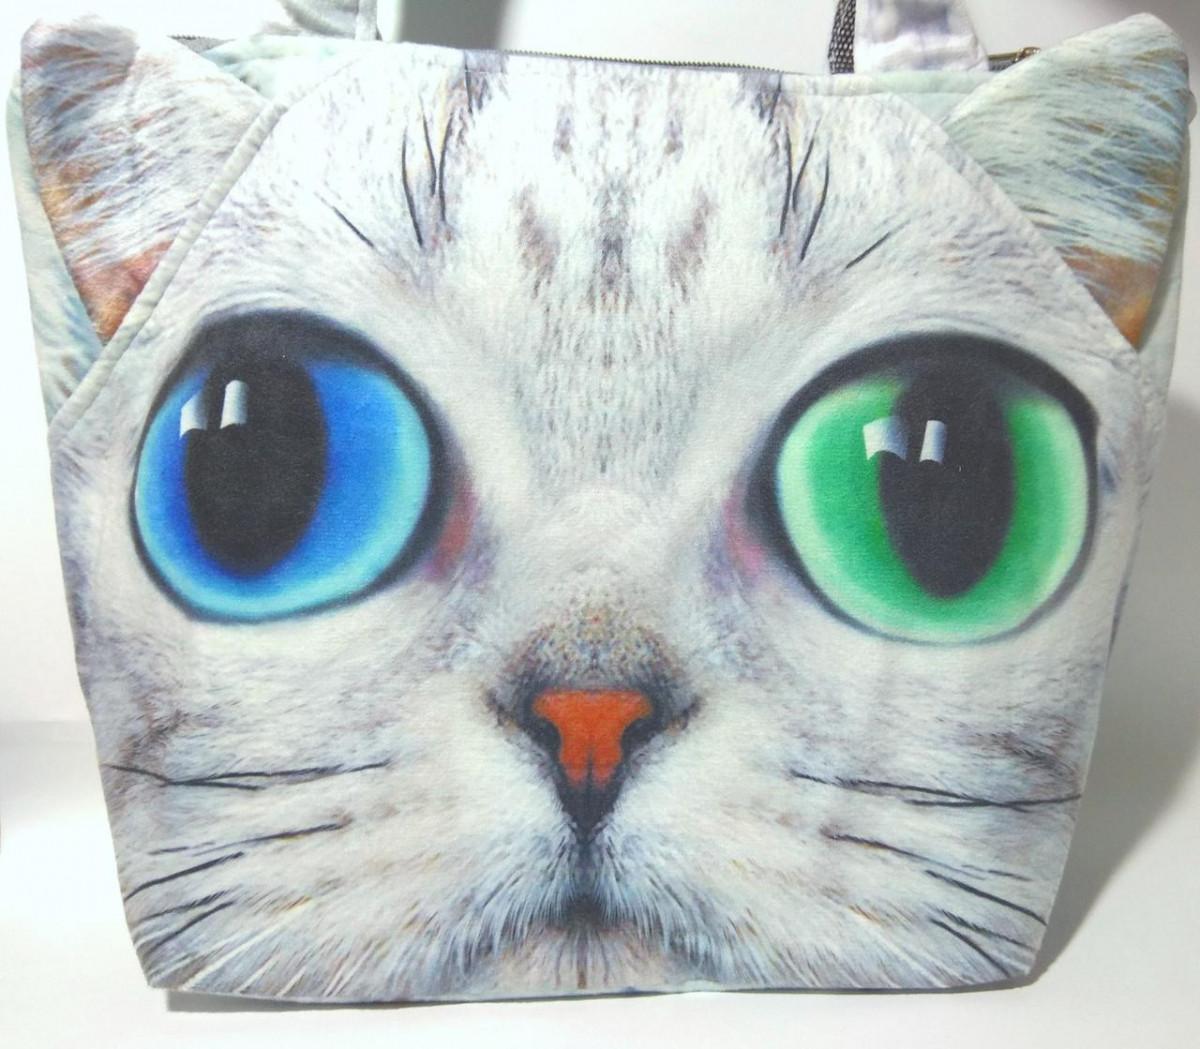 Сумка плюшева Кіт, 29х38 см 3D с принтом животных S-2534 Перс